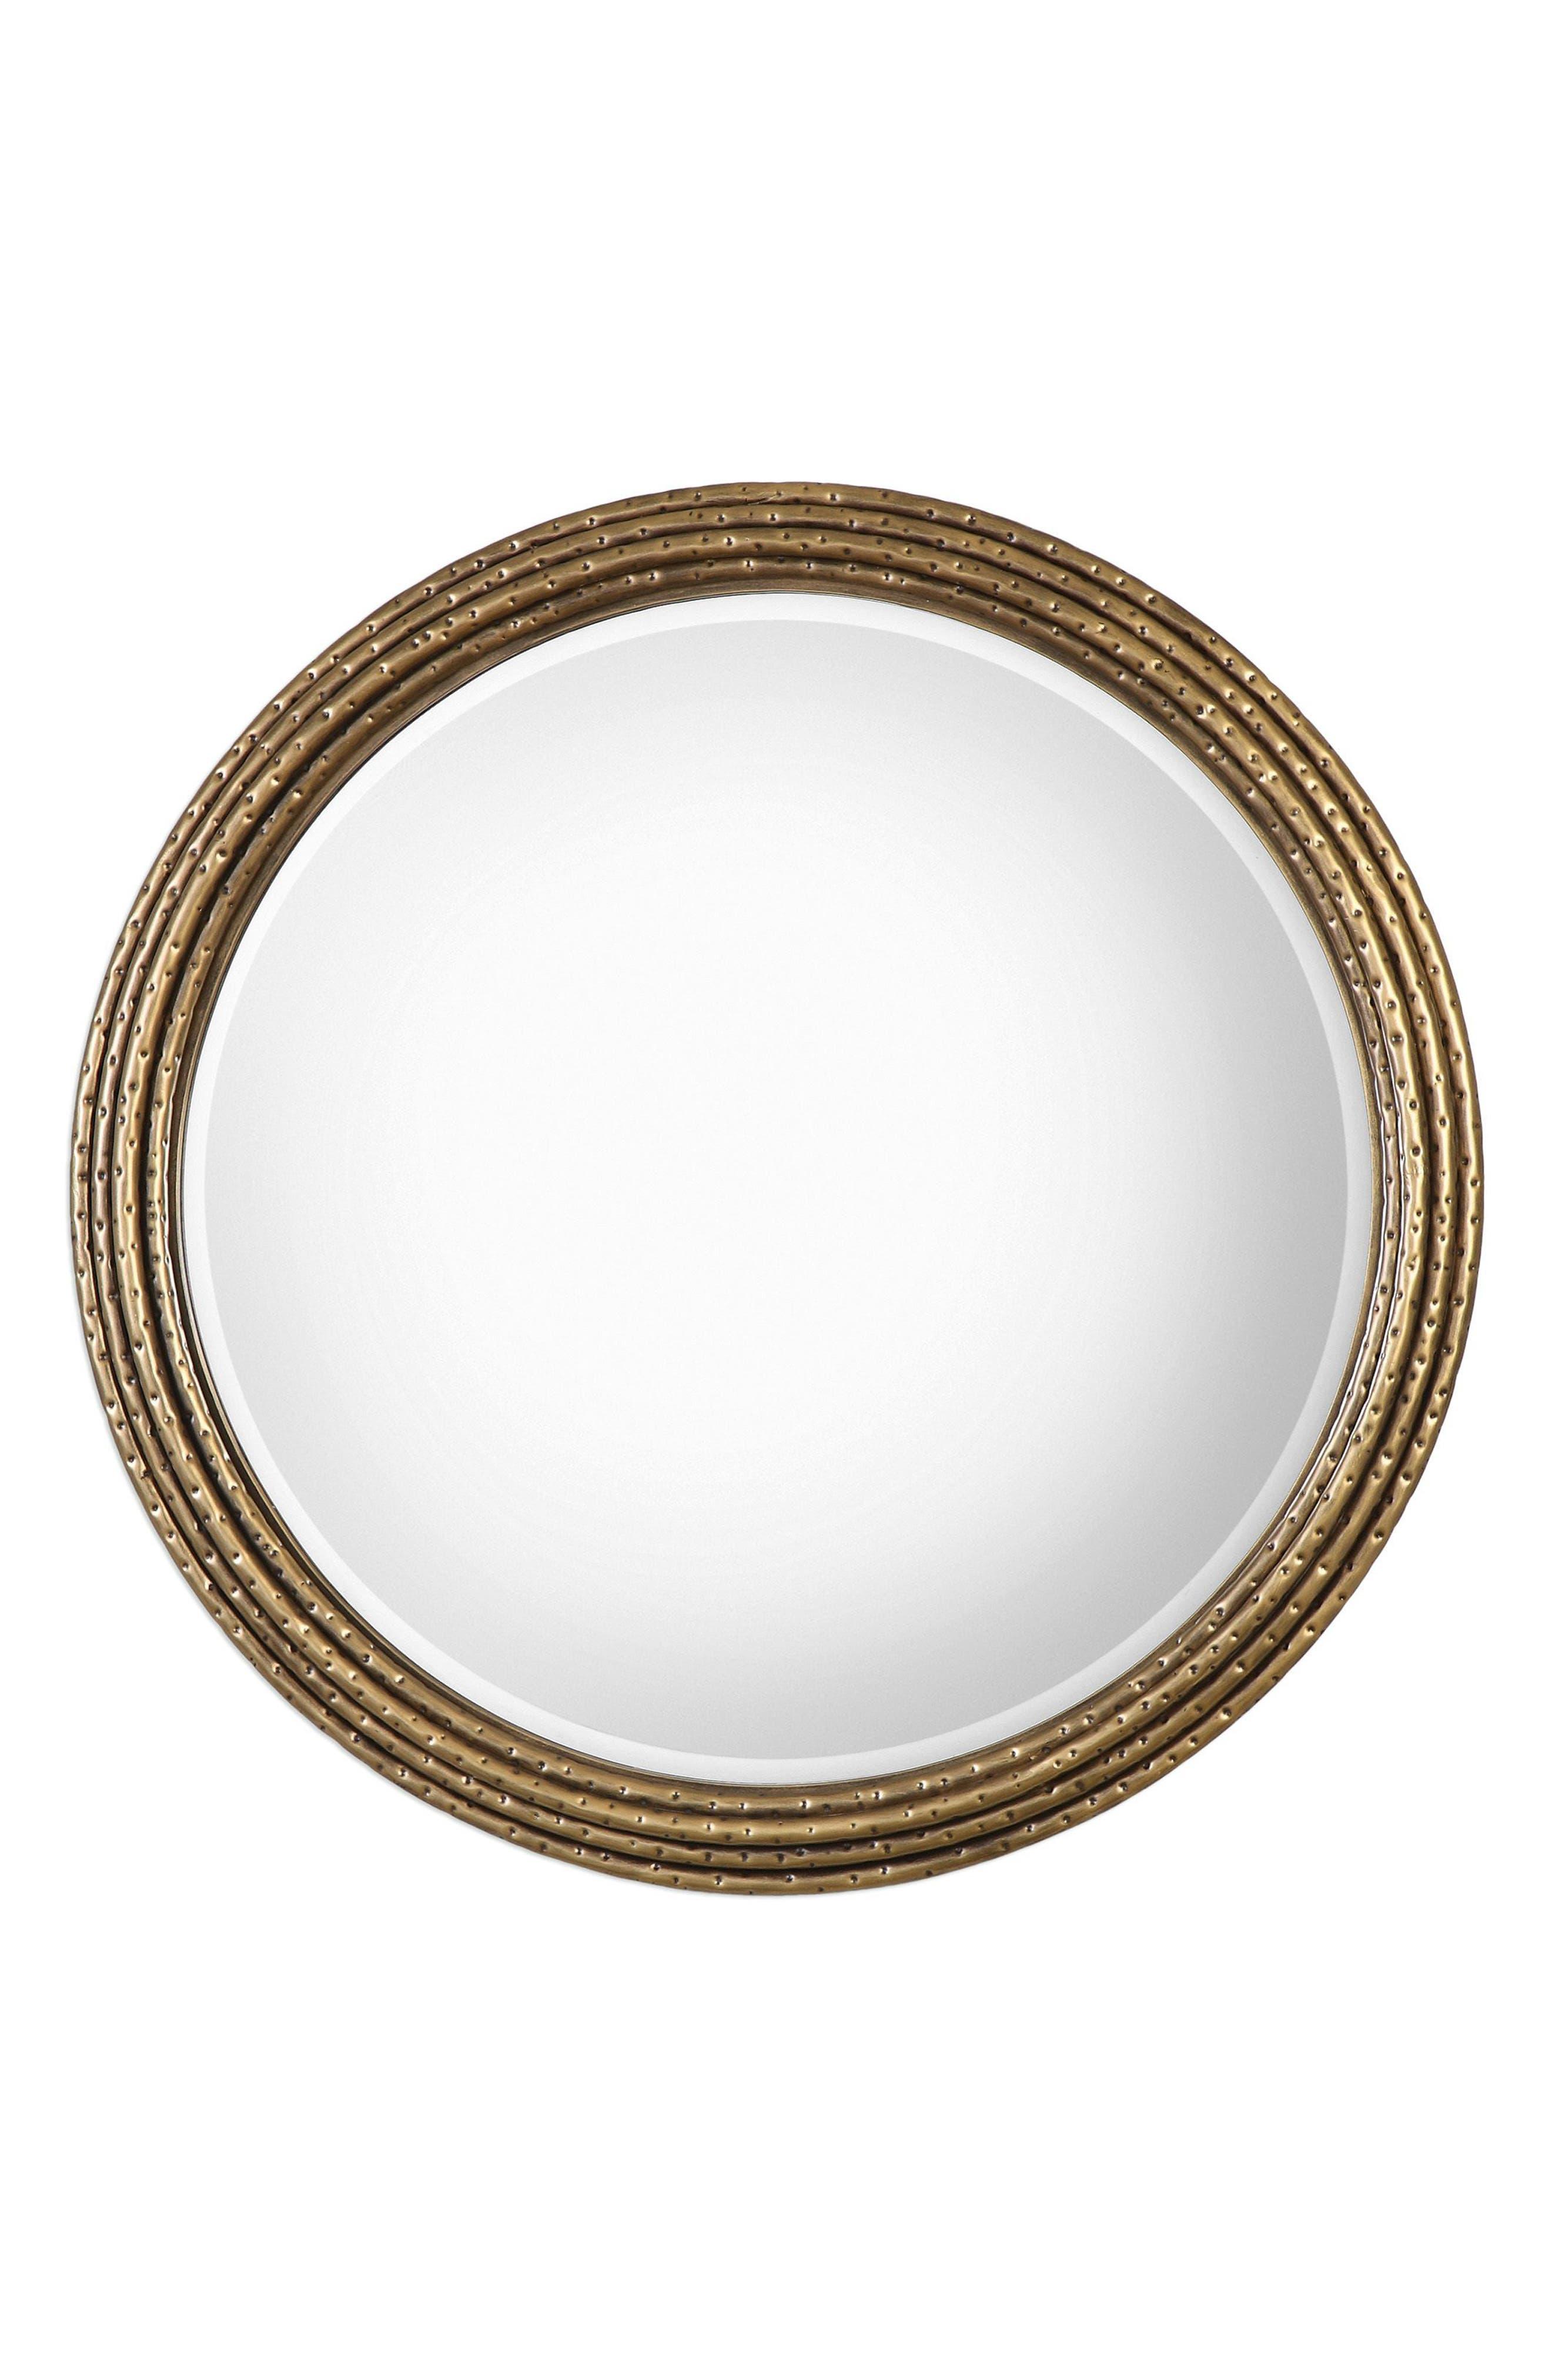 Main Image - Uttermost Spera Wall Mirror